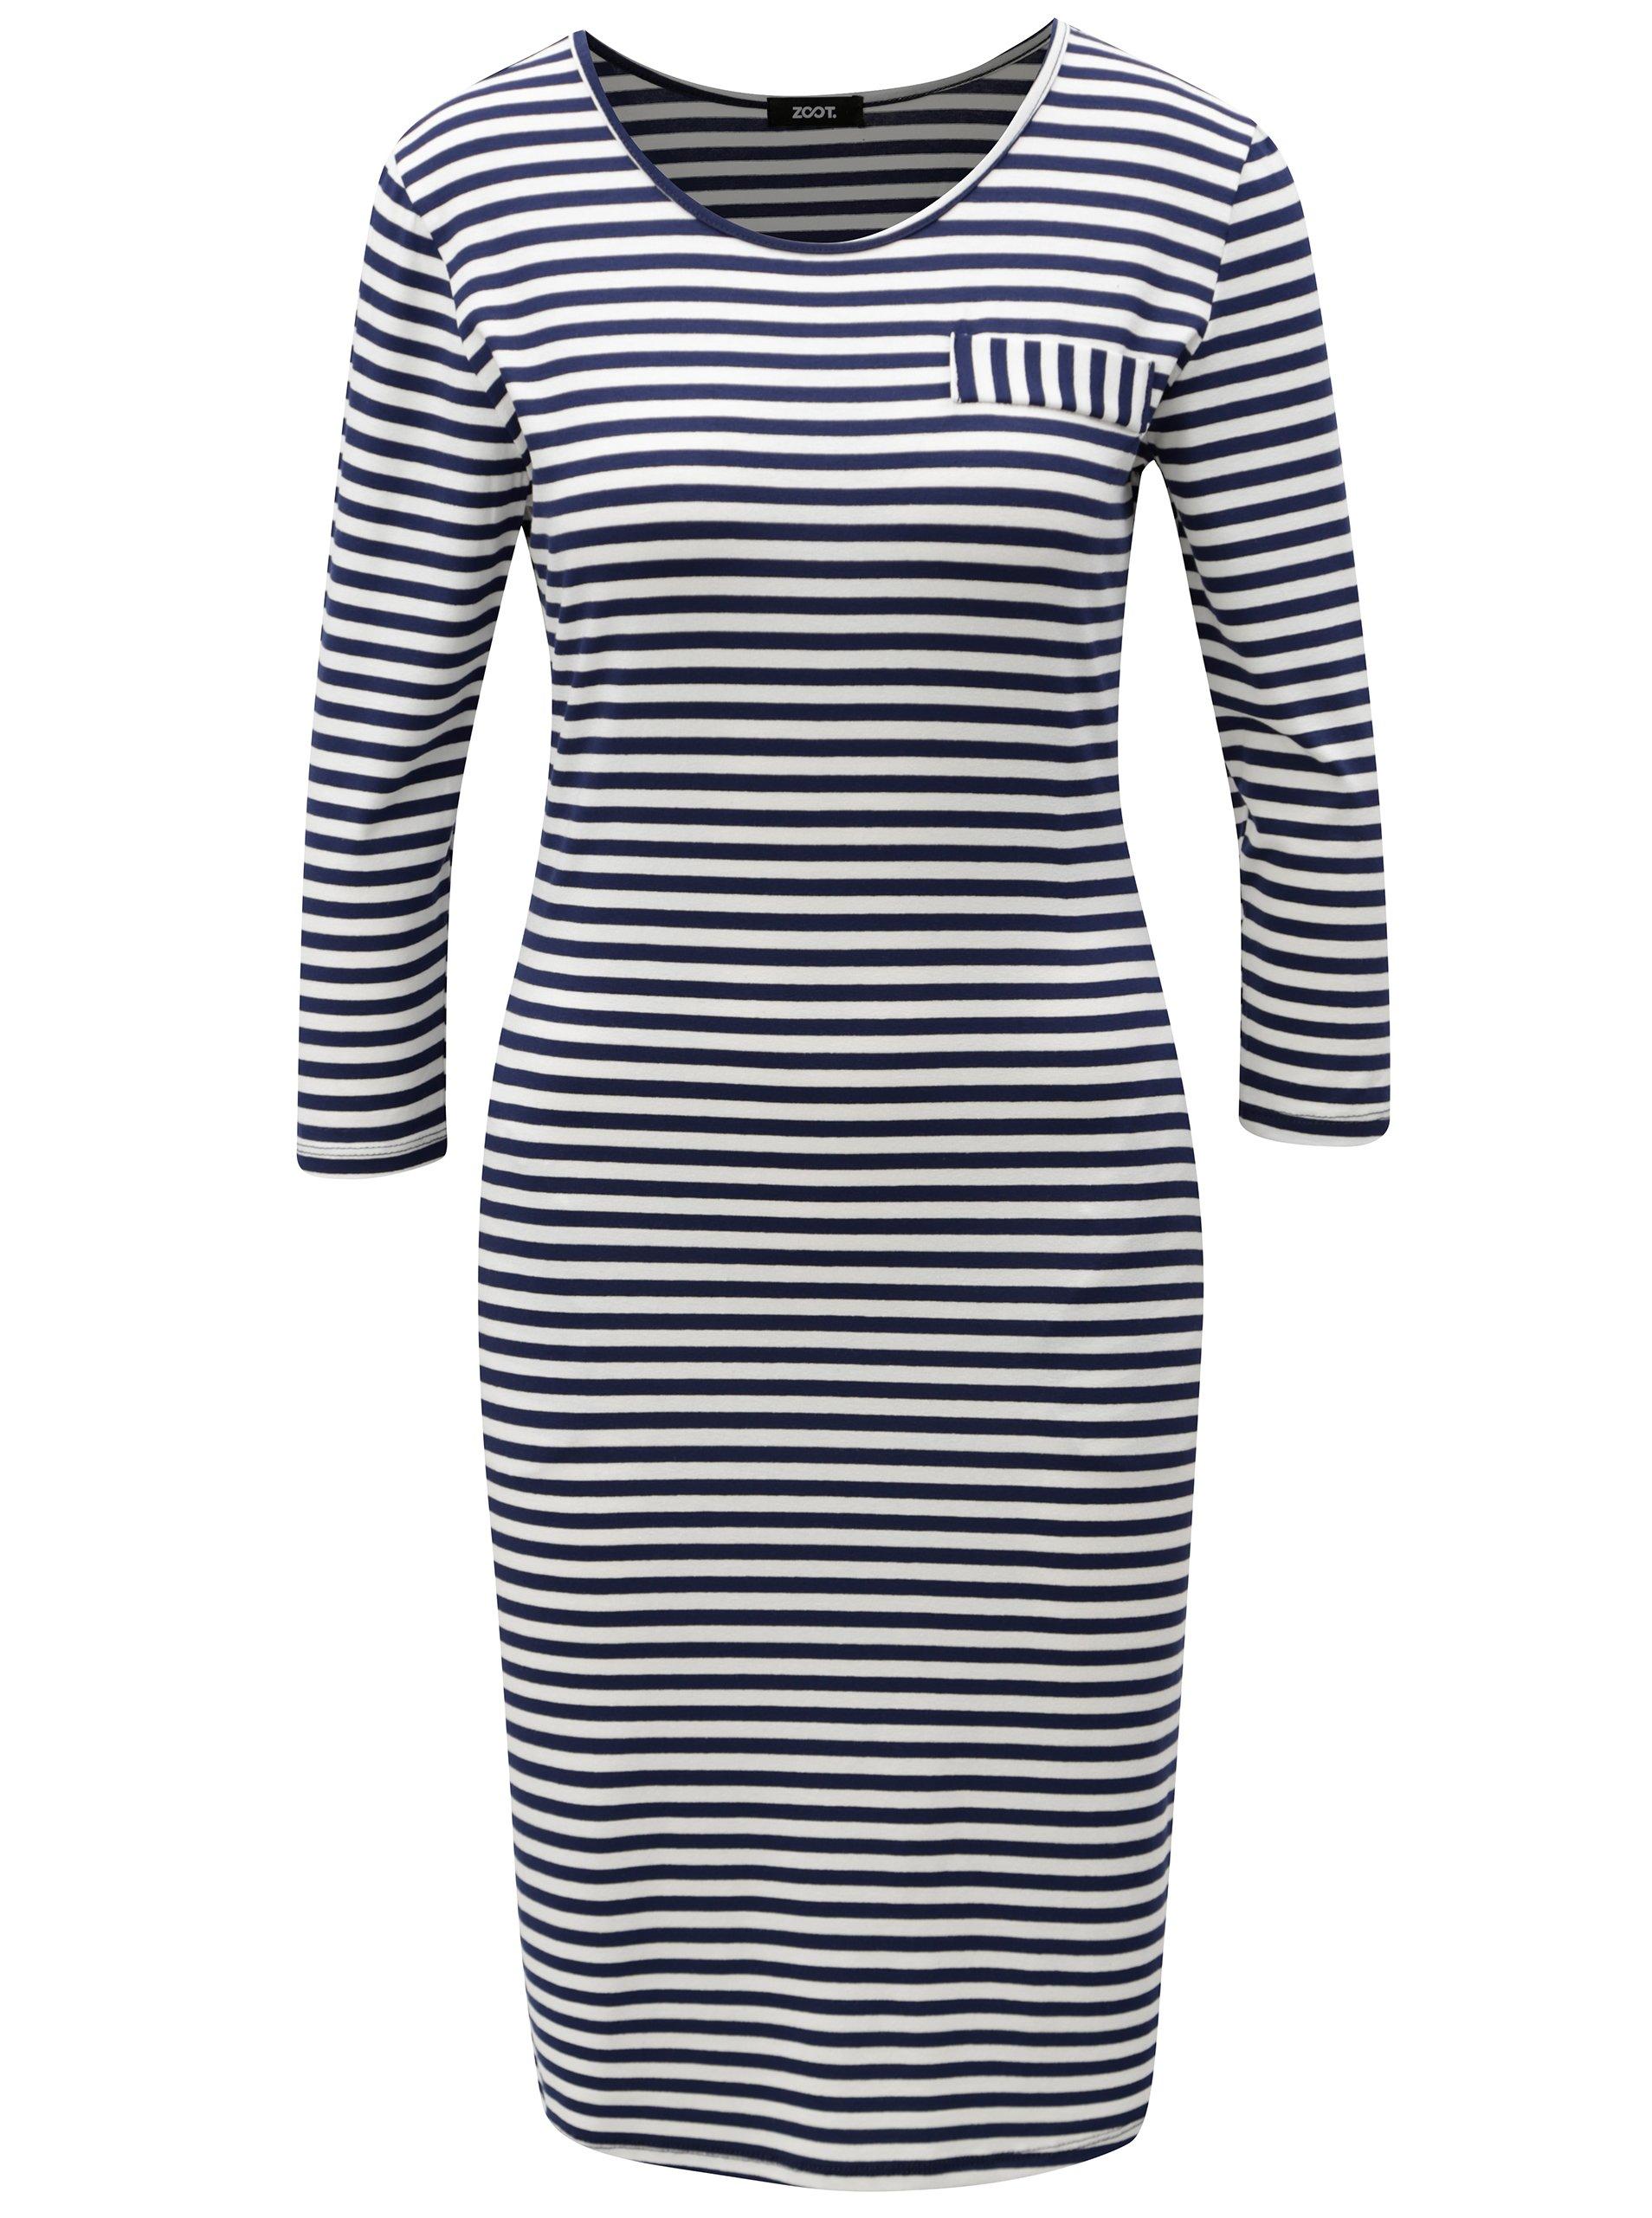 Modro-biele pruhované šaty s vreckami ZOOT  5870d5f8392